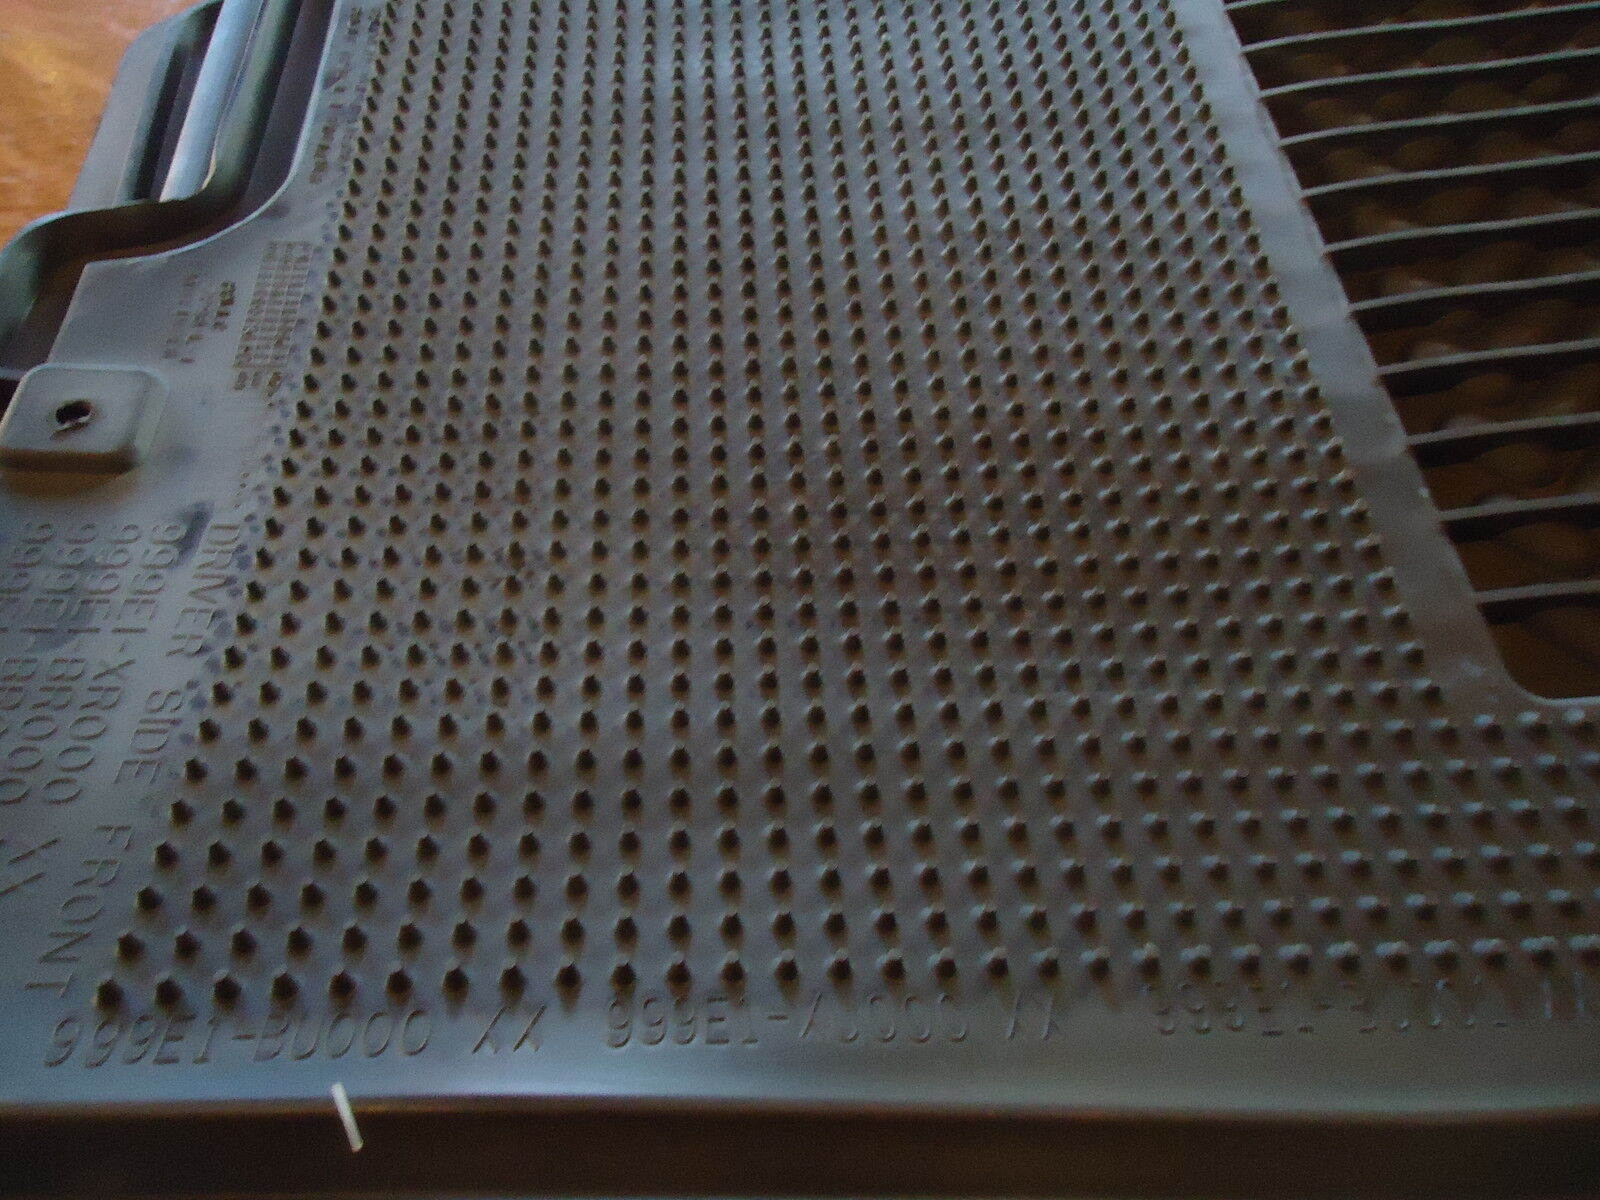 Floor mats xterra - 2005 07 Nissan Xterra Factory 999e1 Kr000 Oem Allseason Floor Mats 7 7 Of 10